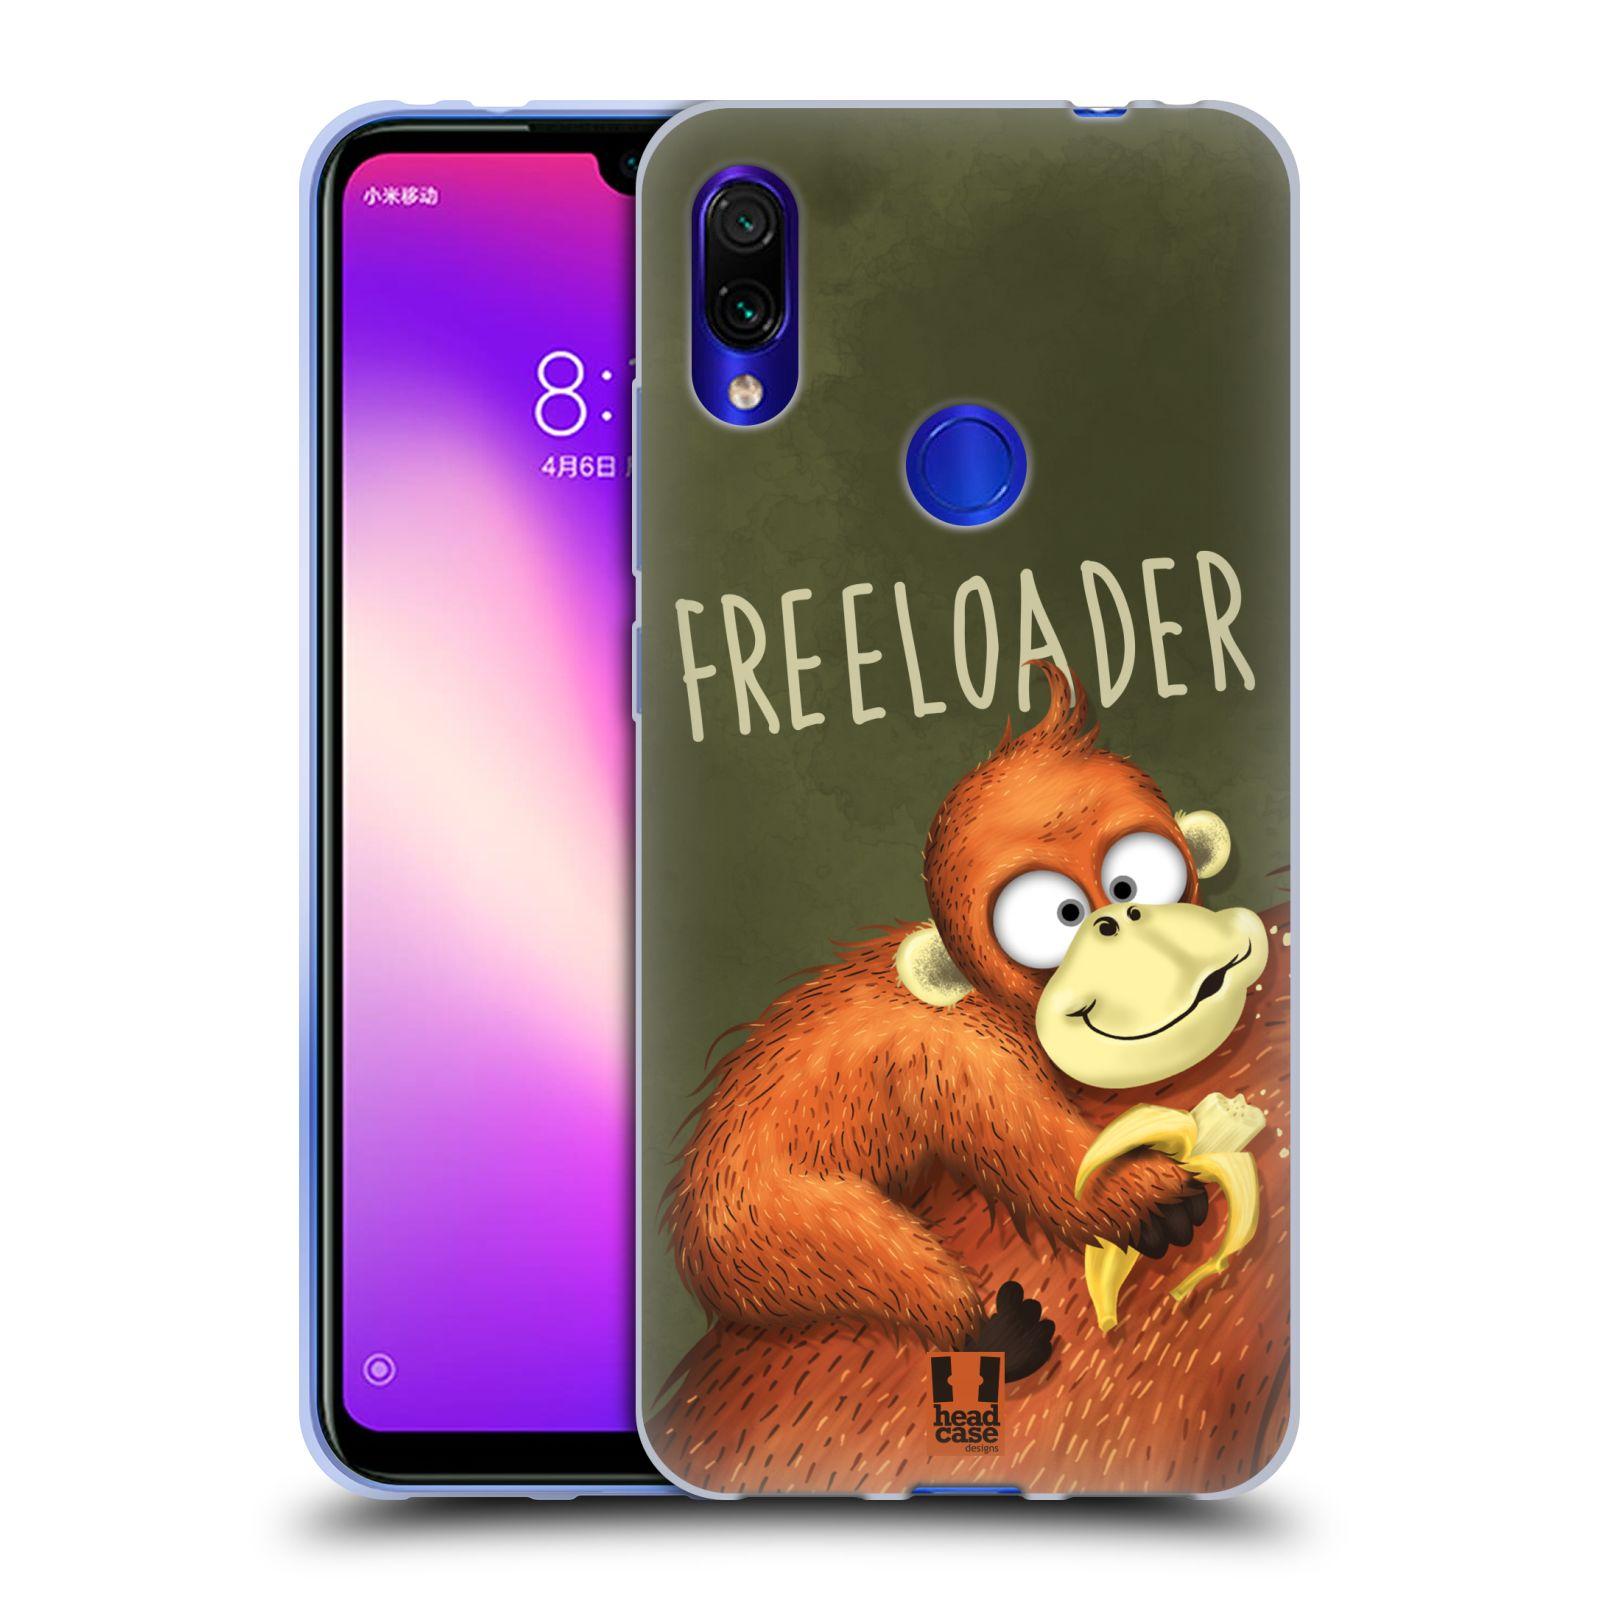 Silikonové pouzdro na mobil Xiaomi Redmi Note 7 - Head Case - Opičák Freeloader